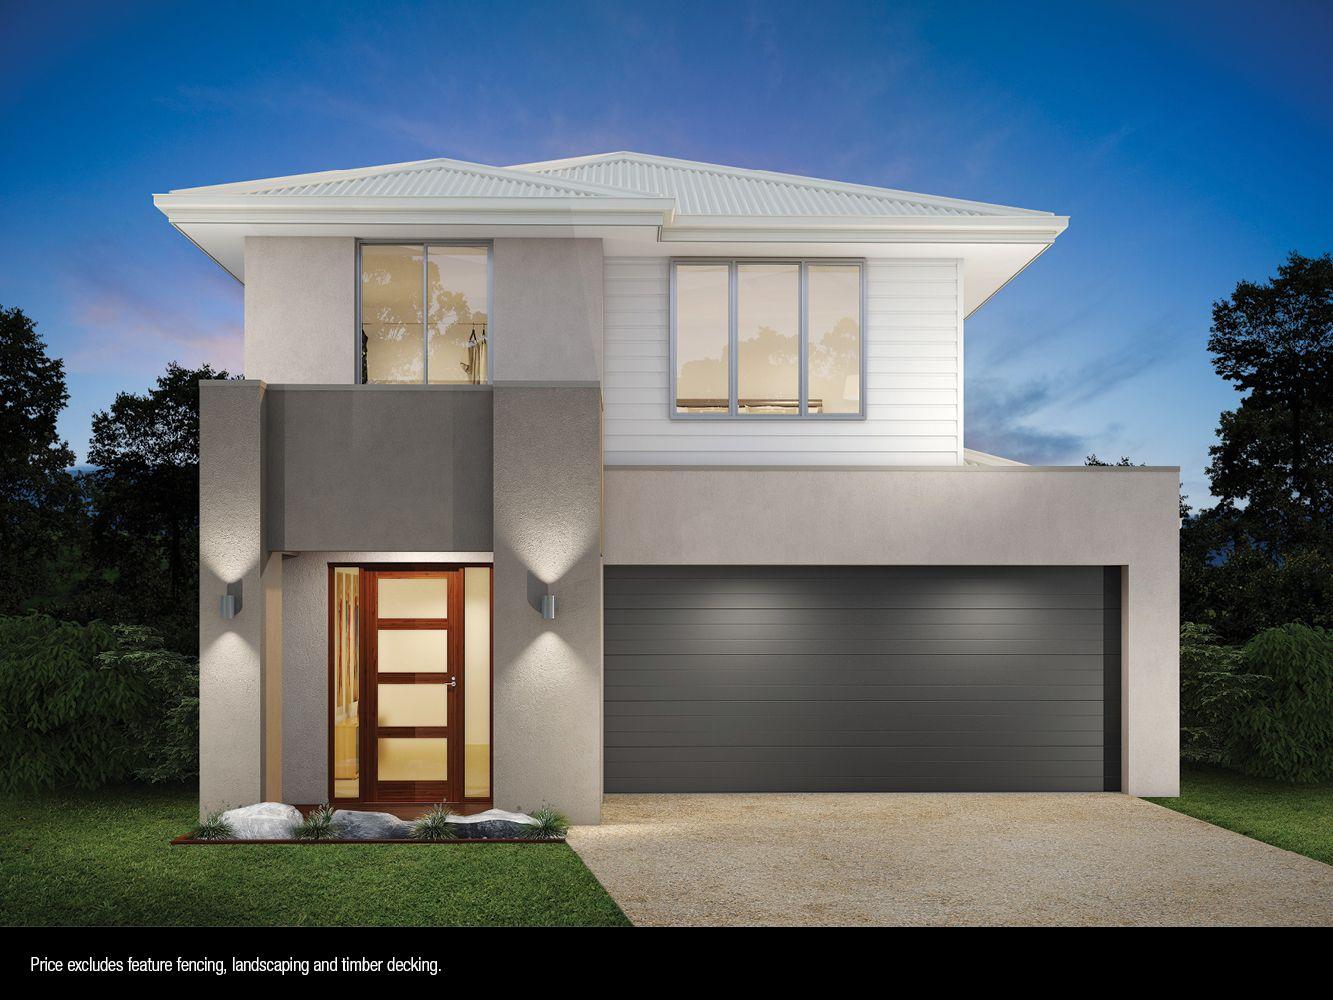 Lot 31 New Road, Coomera QLD 4209, Image 0